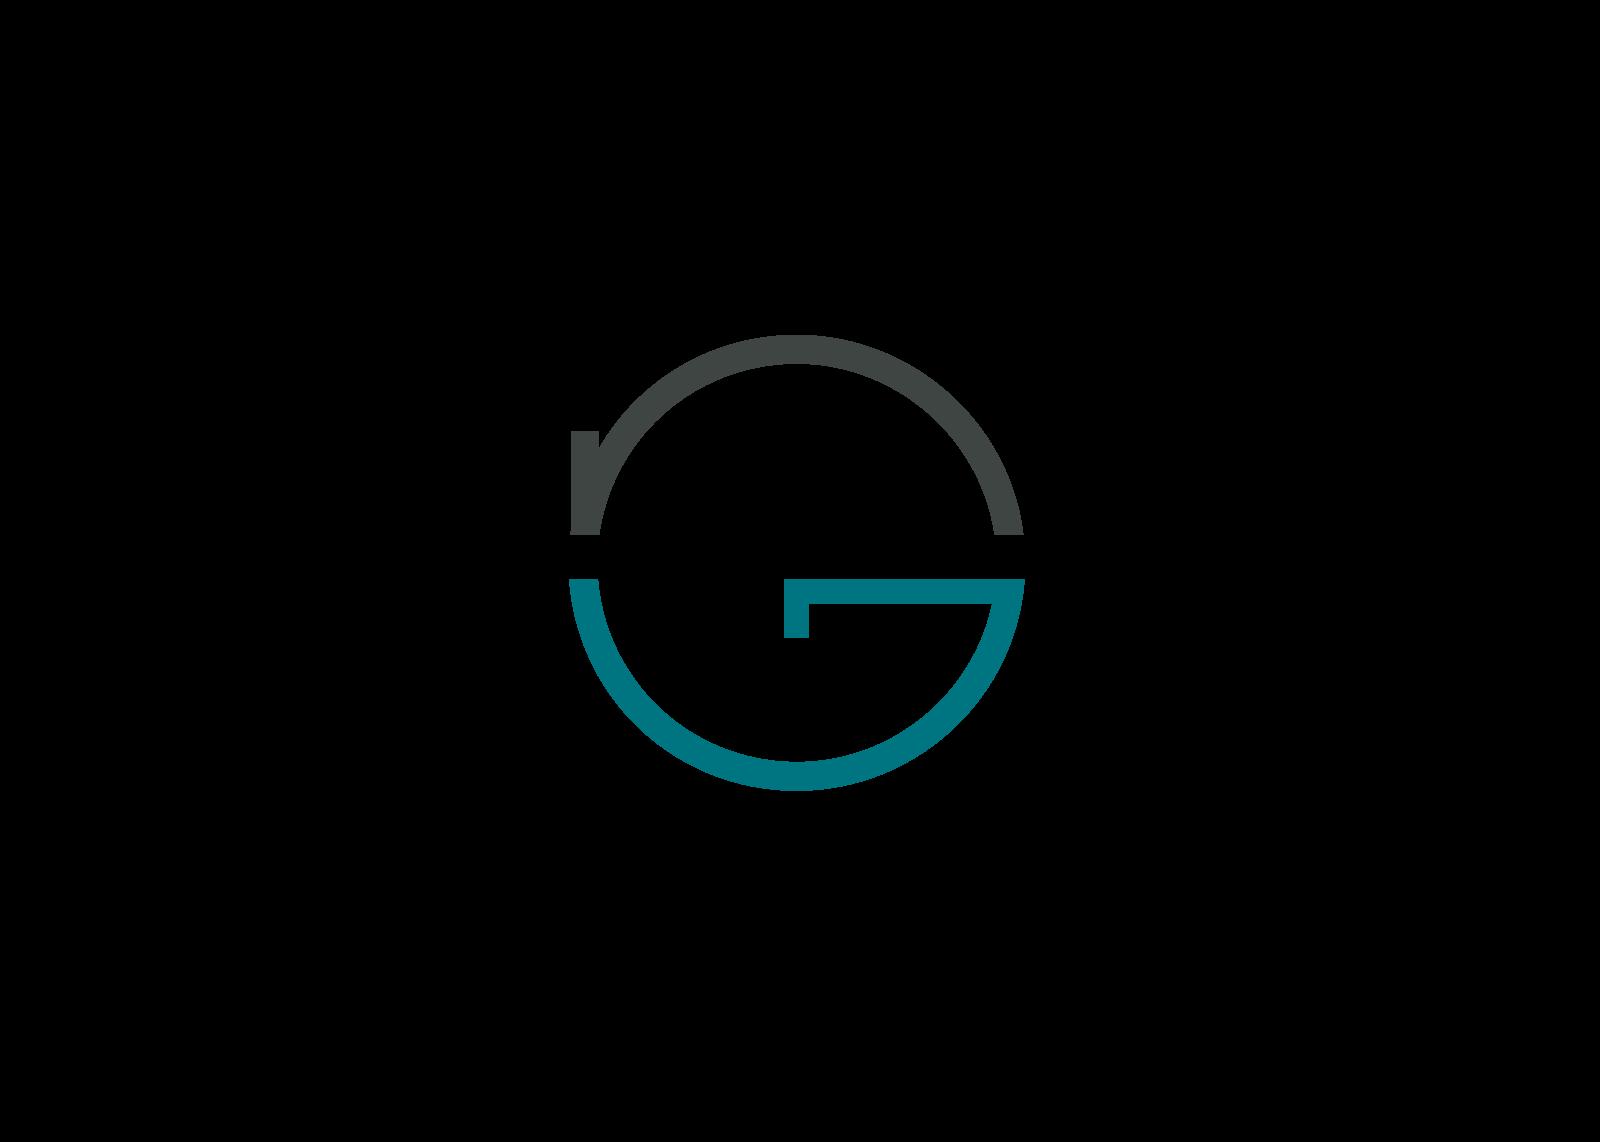 logo design startup